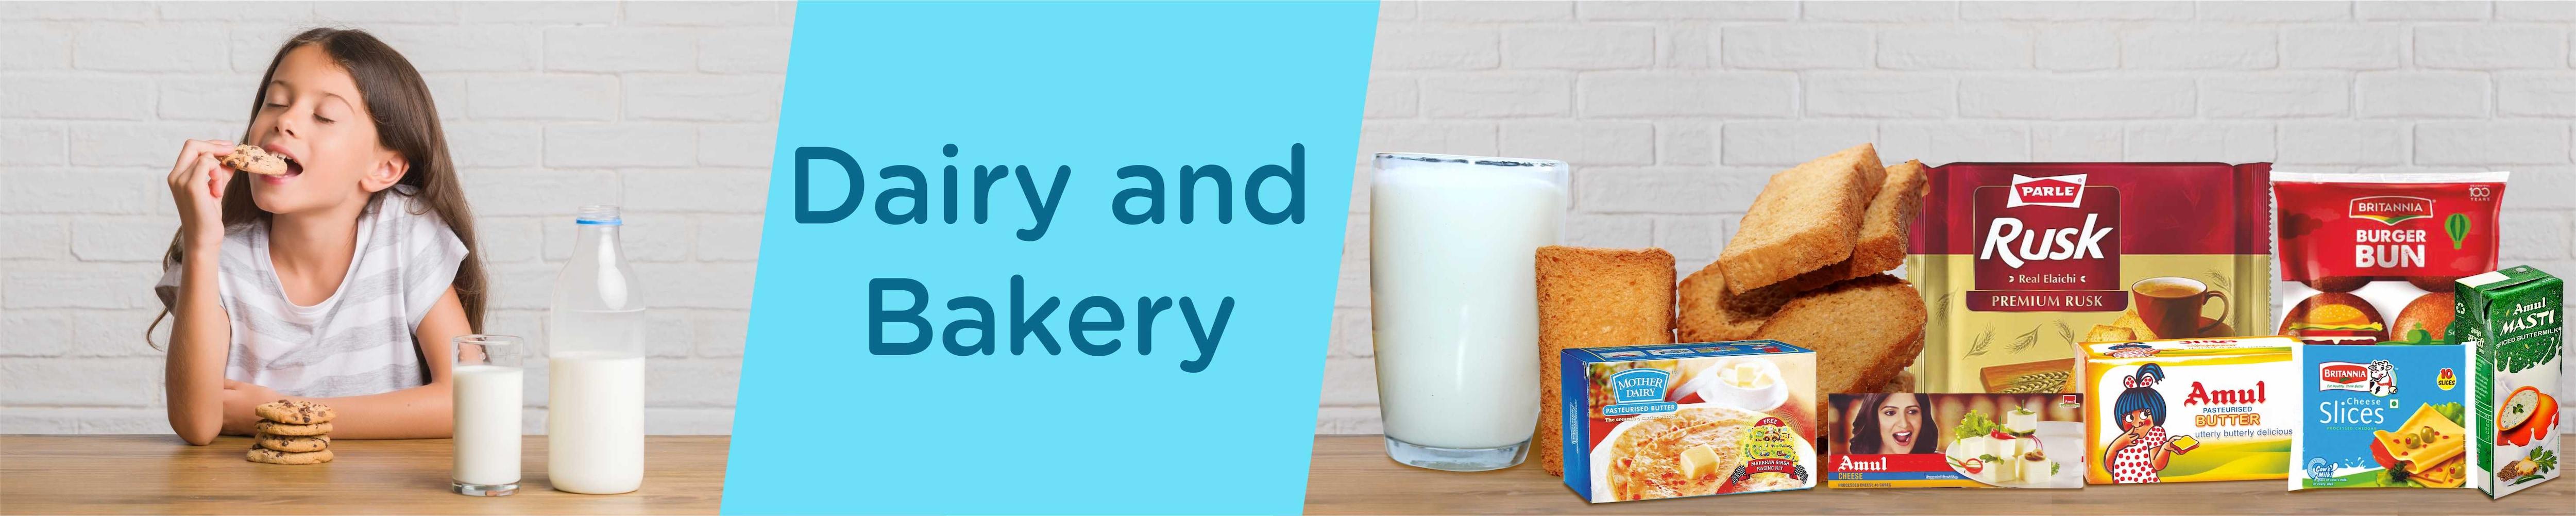 Dairy & Bakery